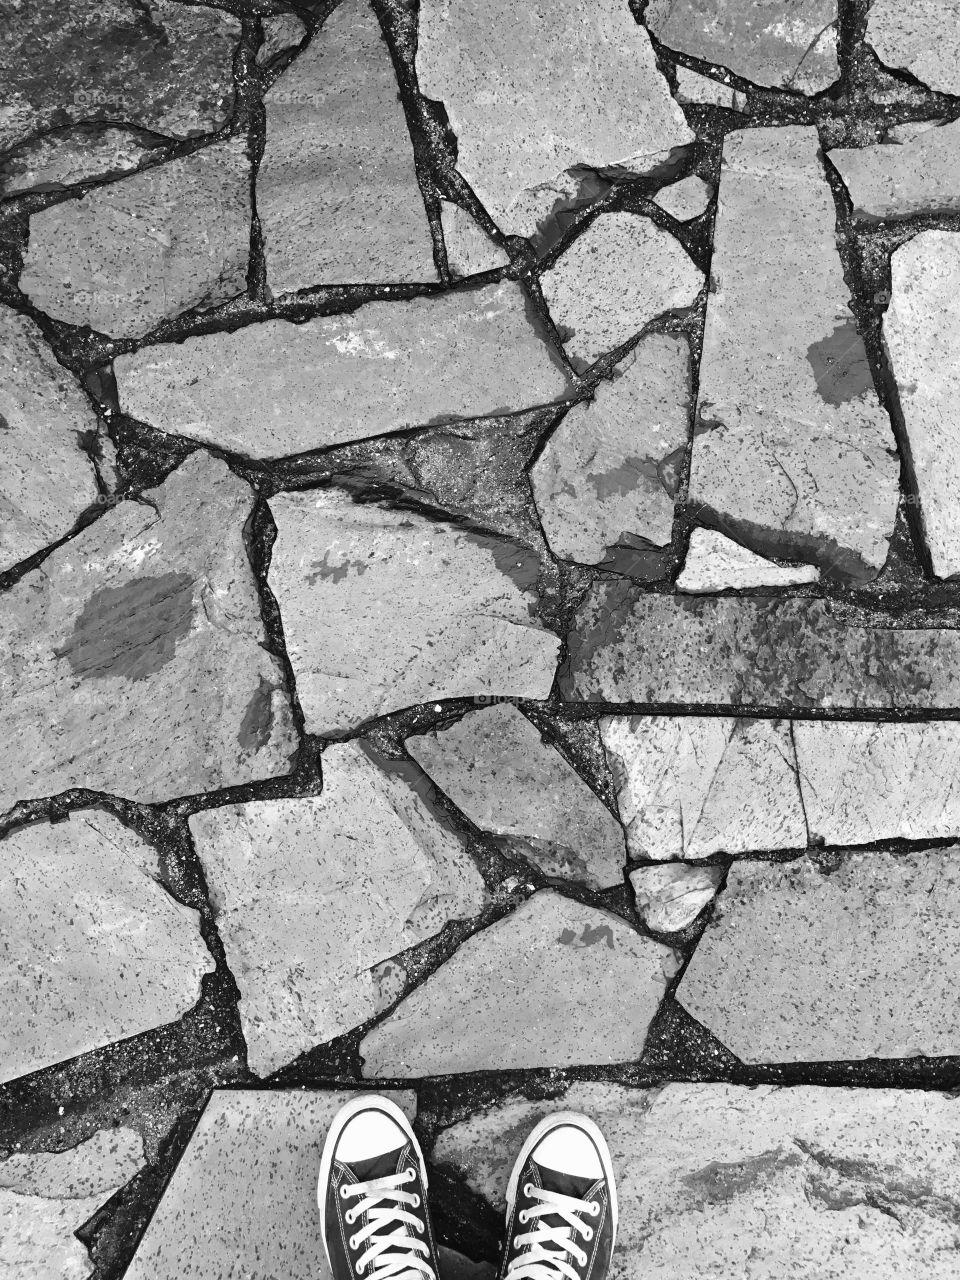 Canvas Shoes on Stone Pavement